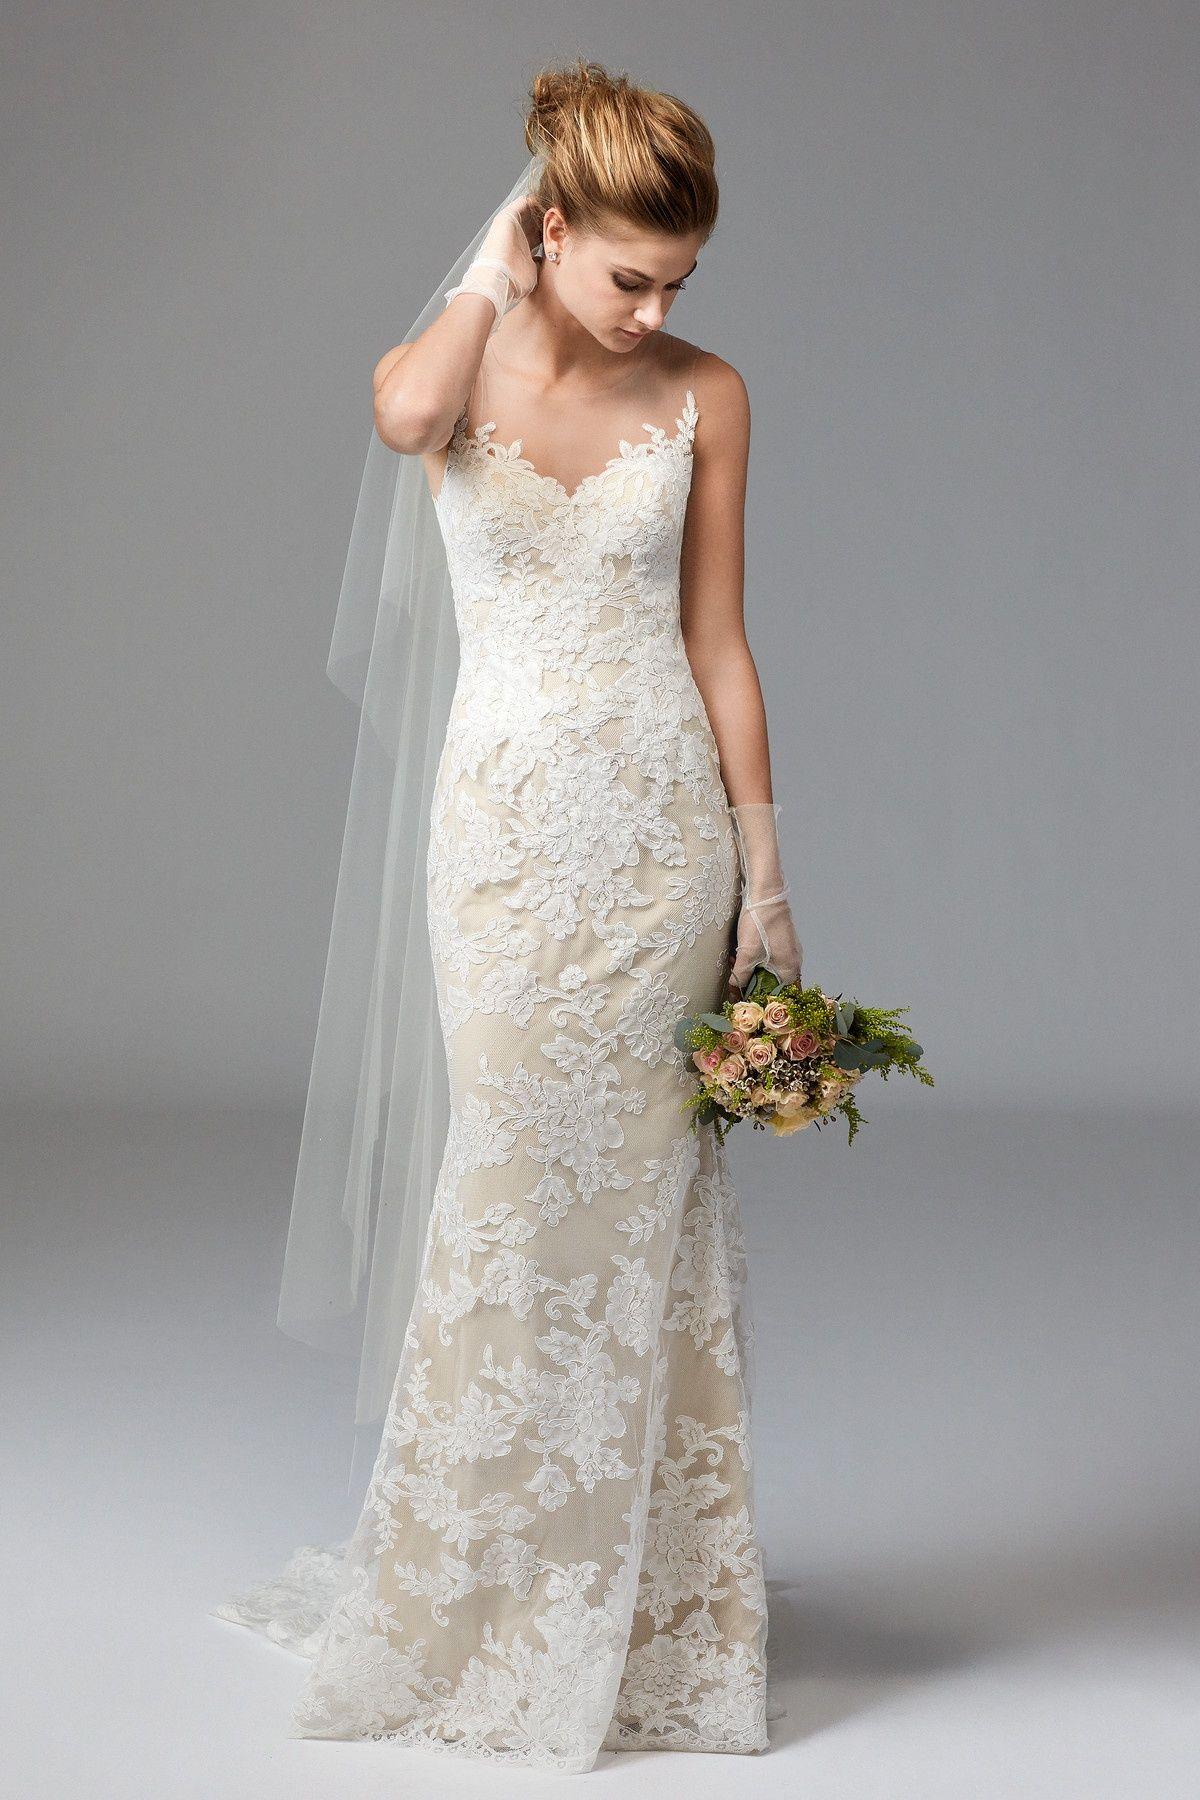 Zella 1012B | Brides | Watters